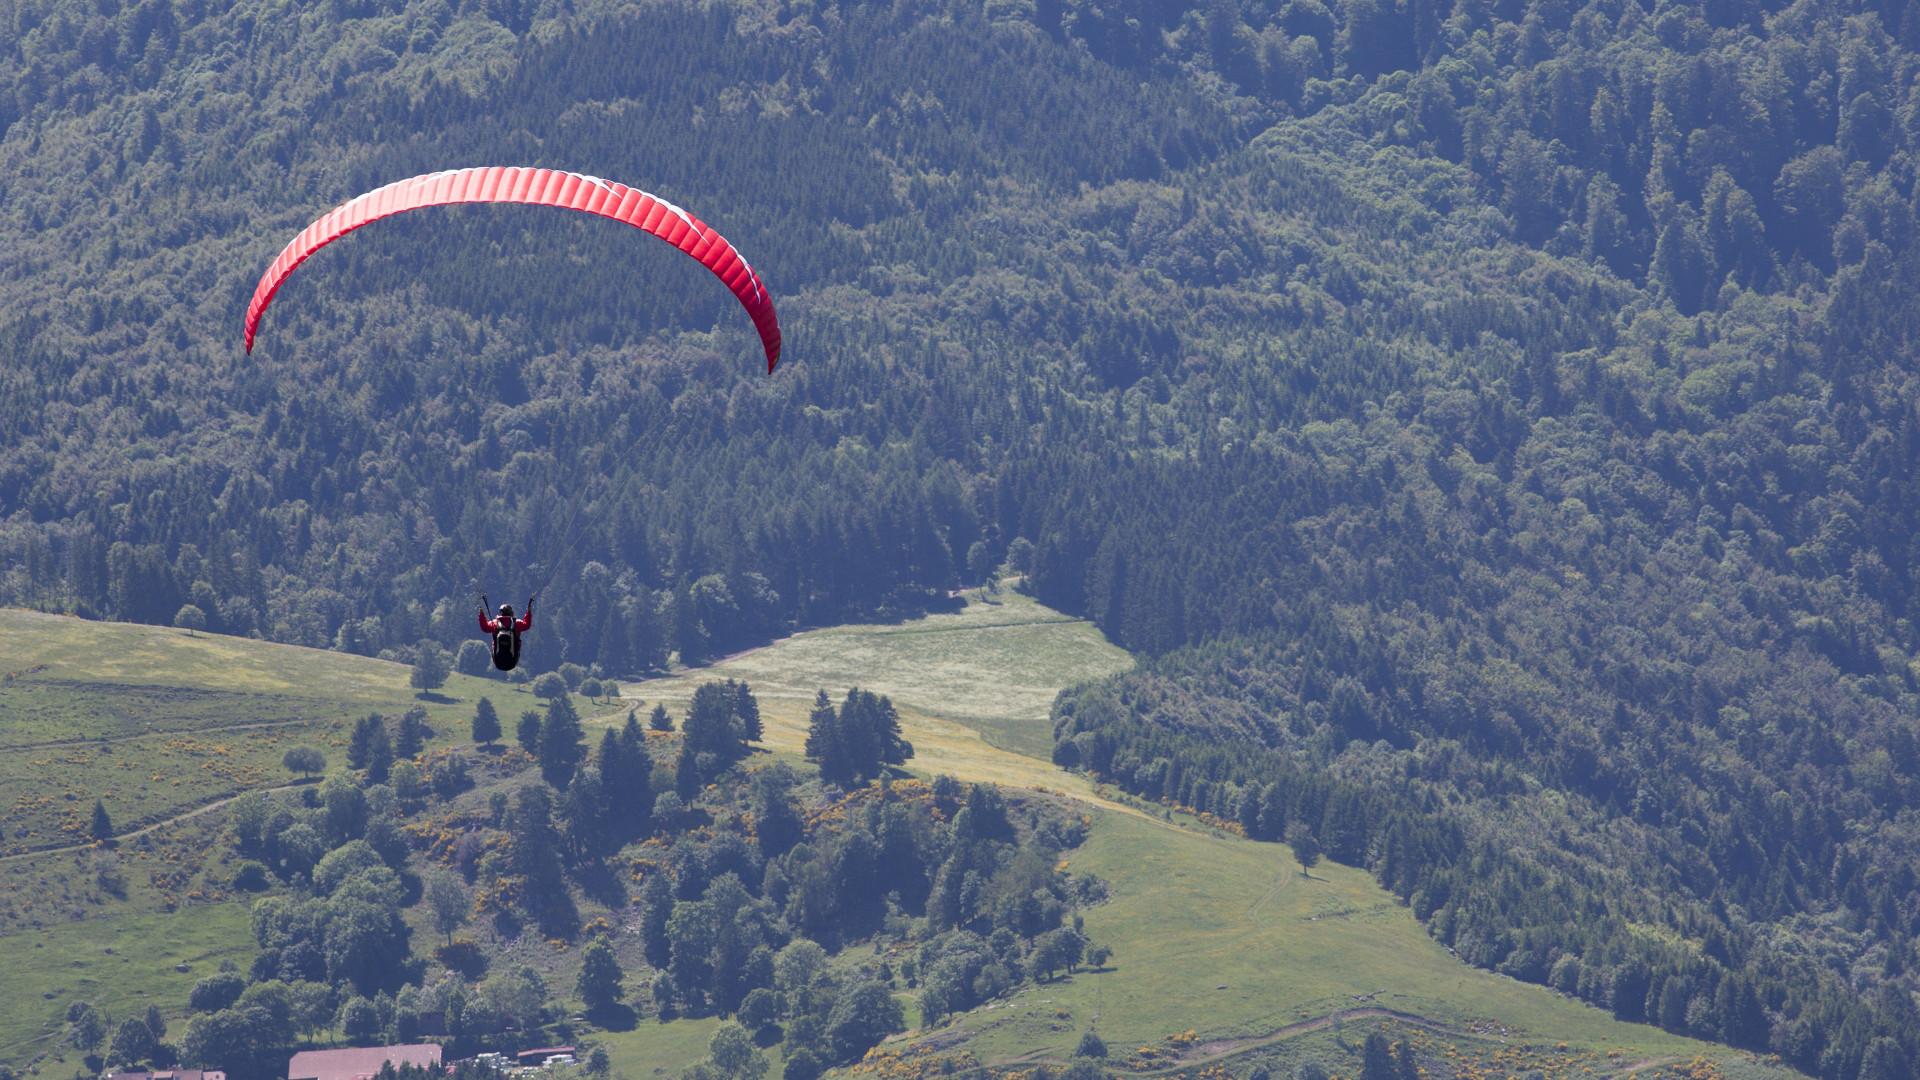 paragliding 1920x1080 wallpaper | download link